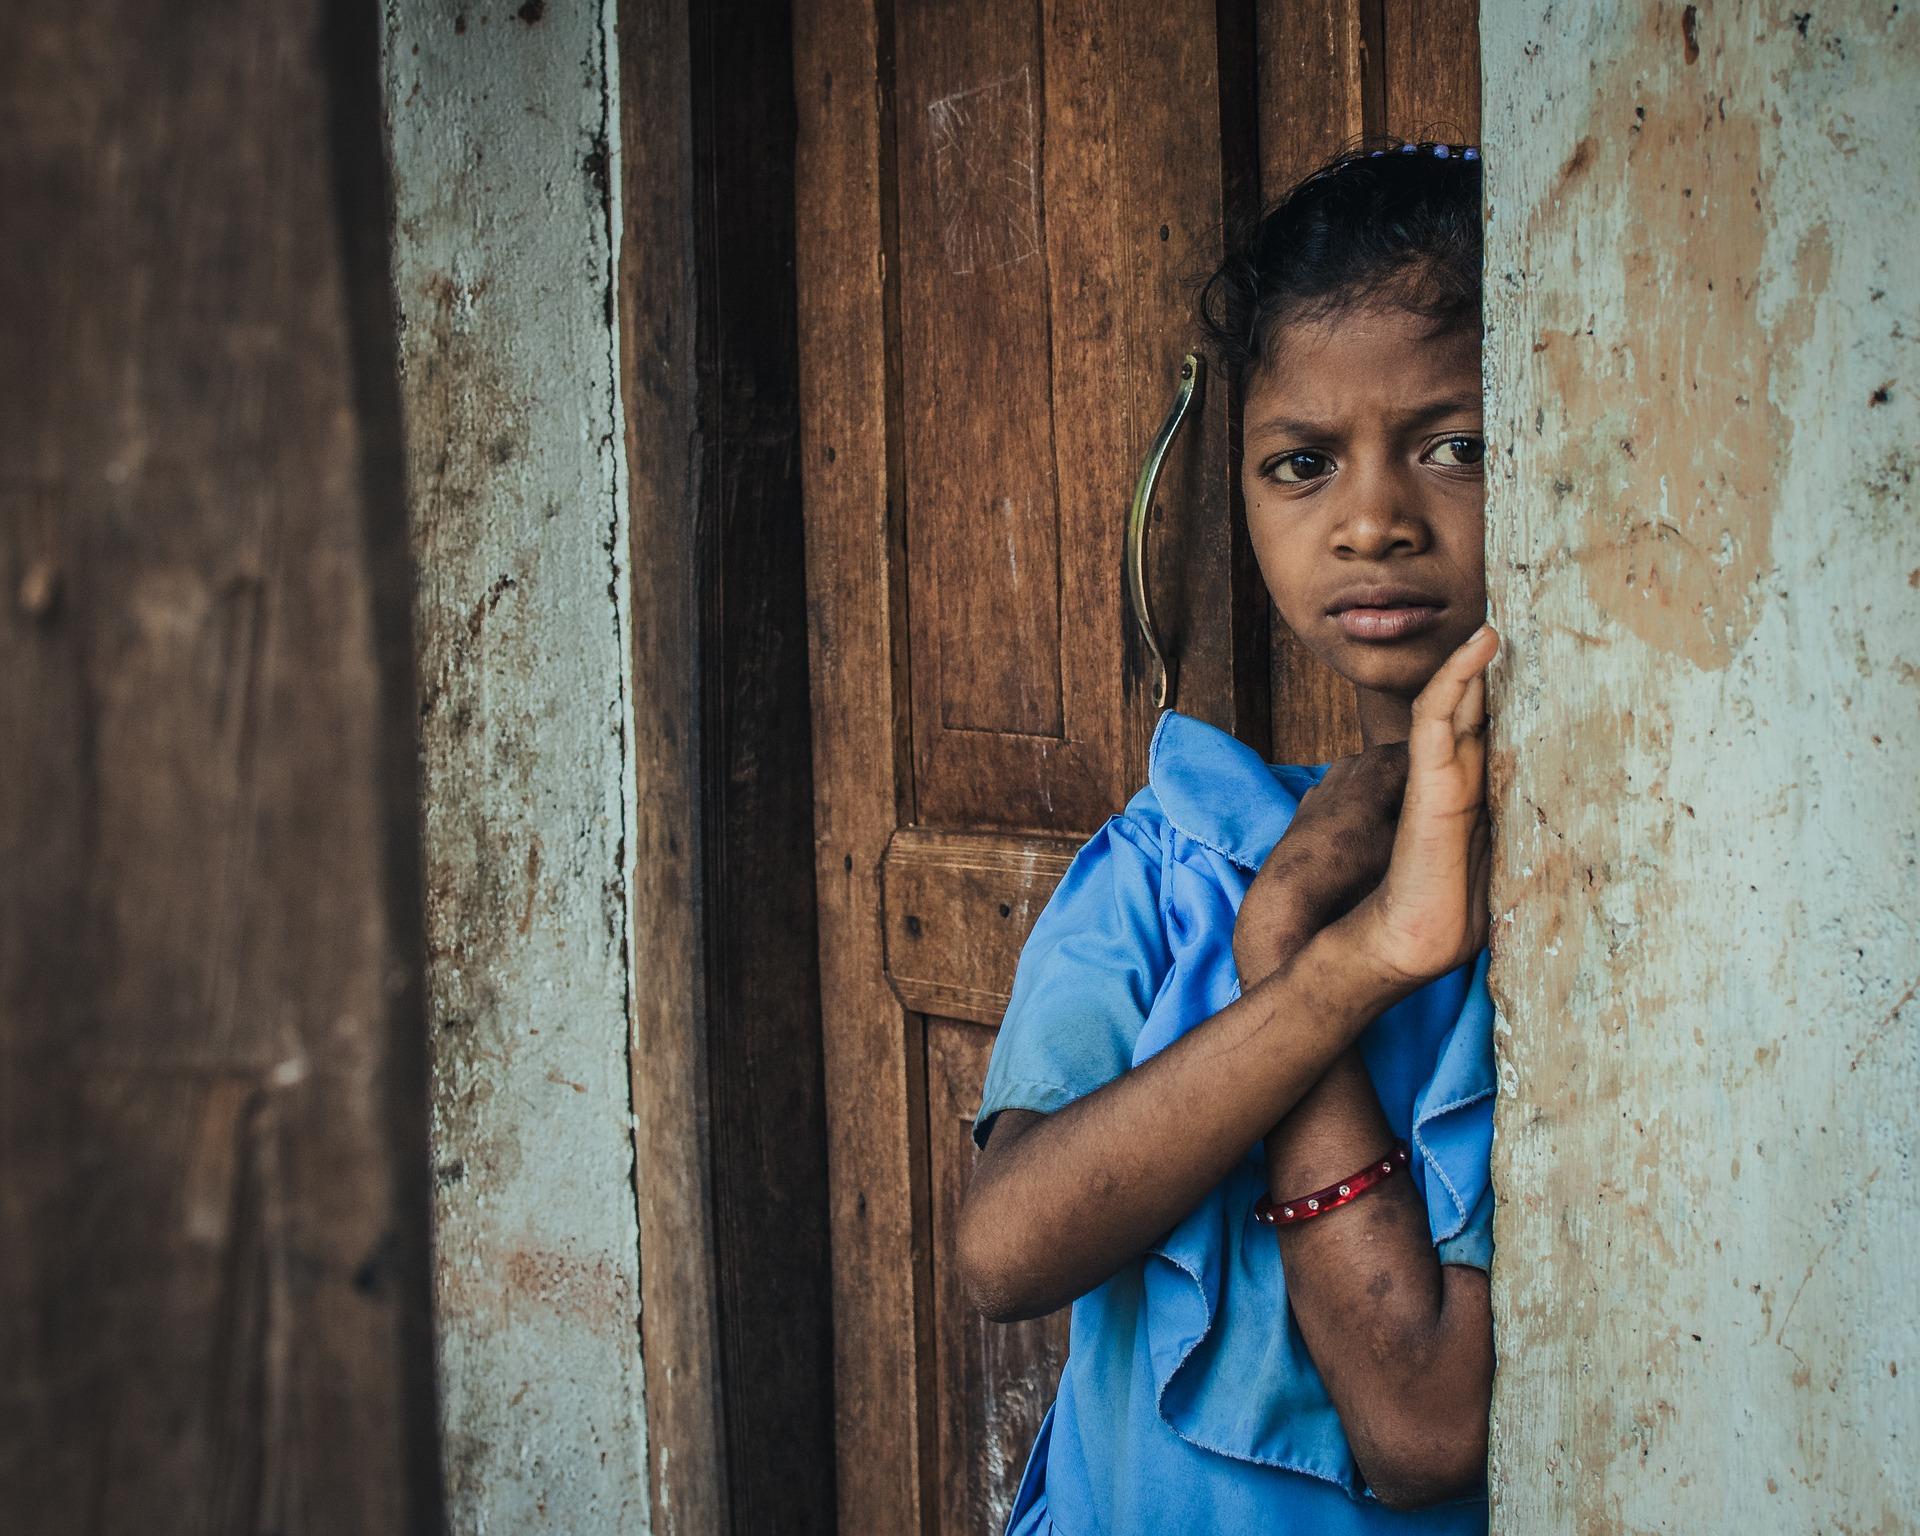 Dalits, religious minorities suffer under Hindu rule